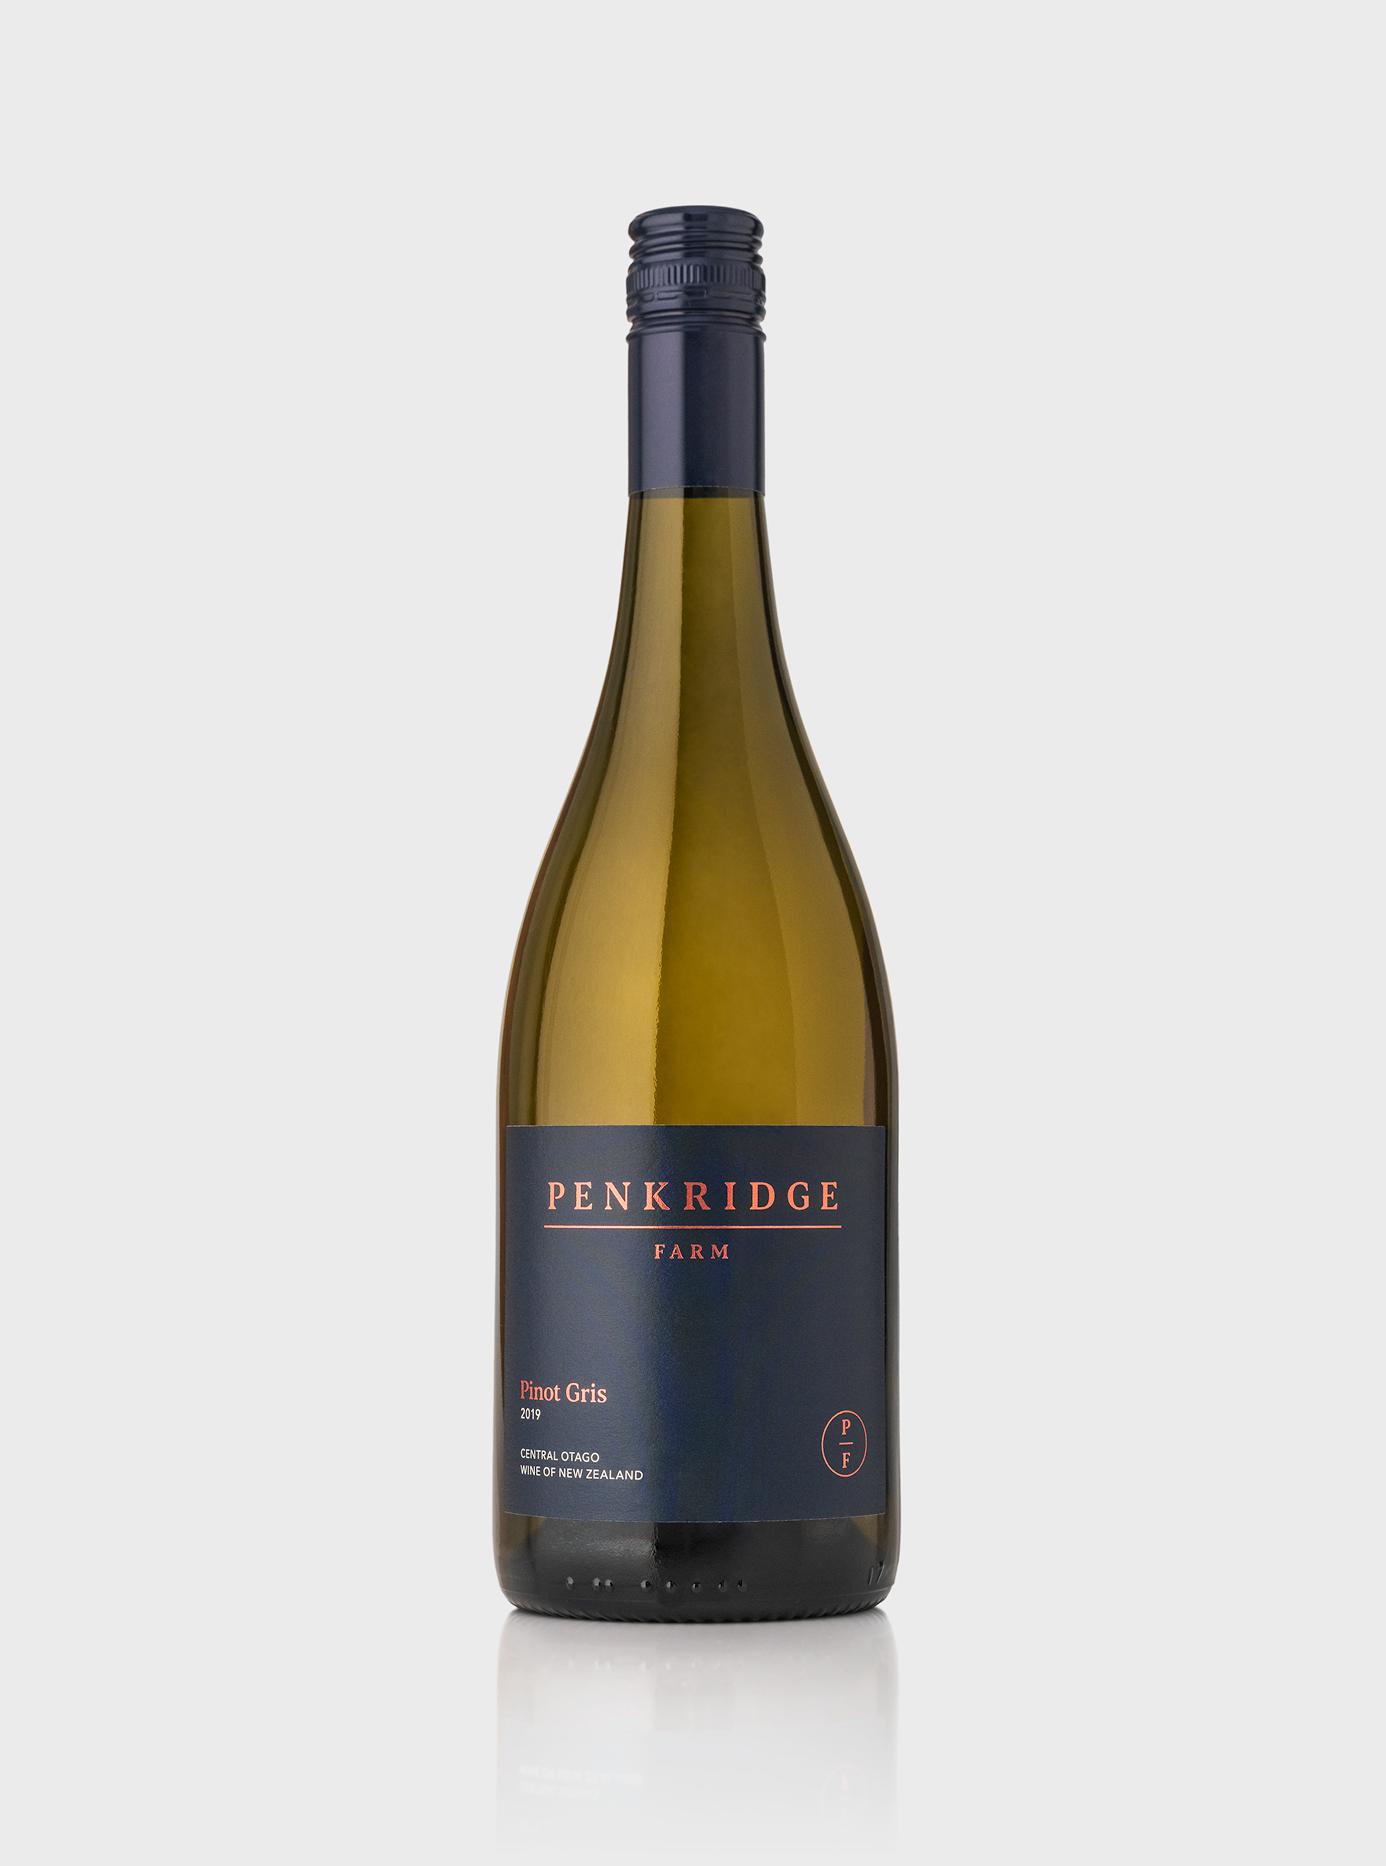 Penkridge Farm wine bottle label